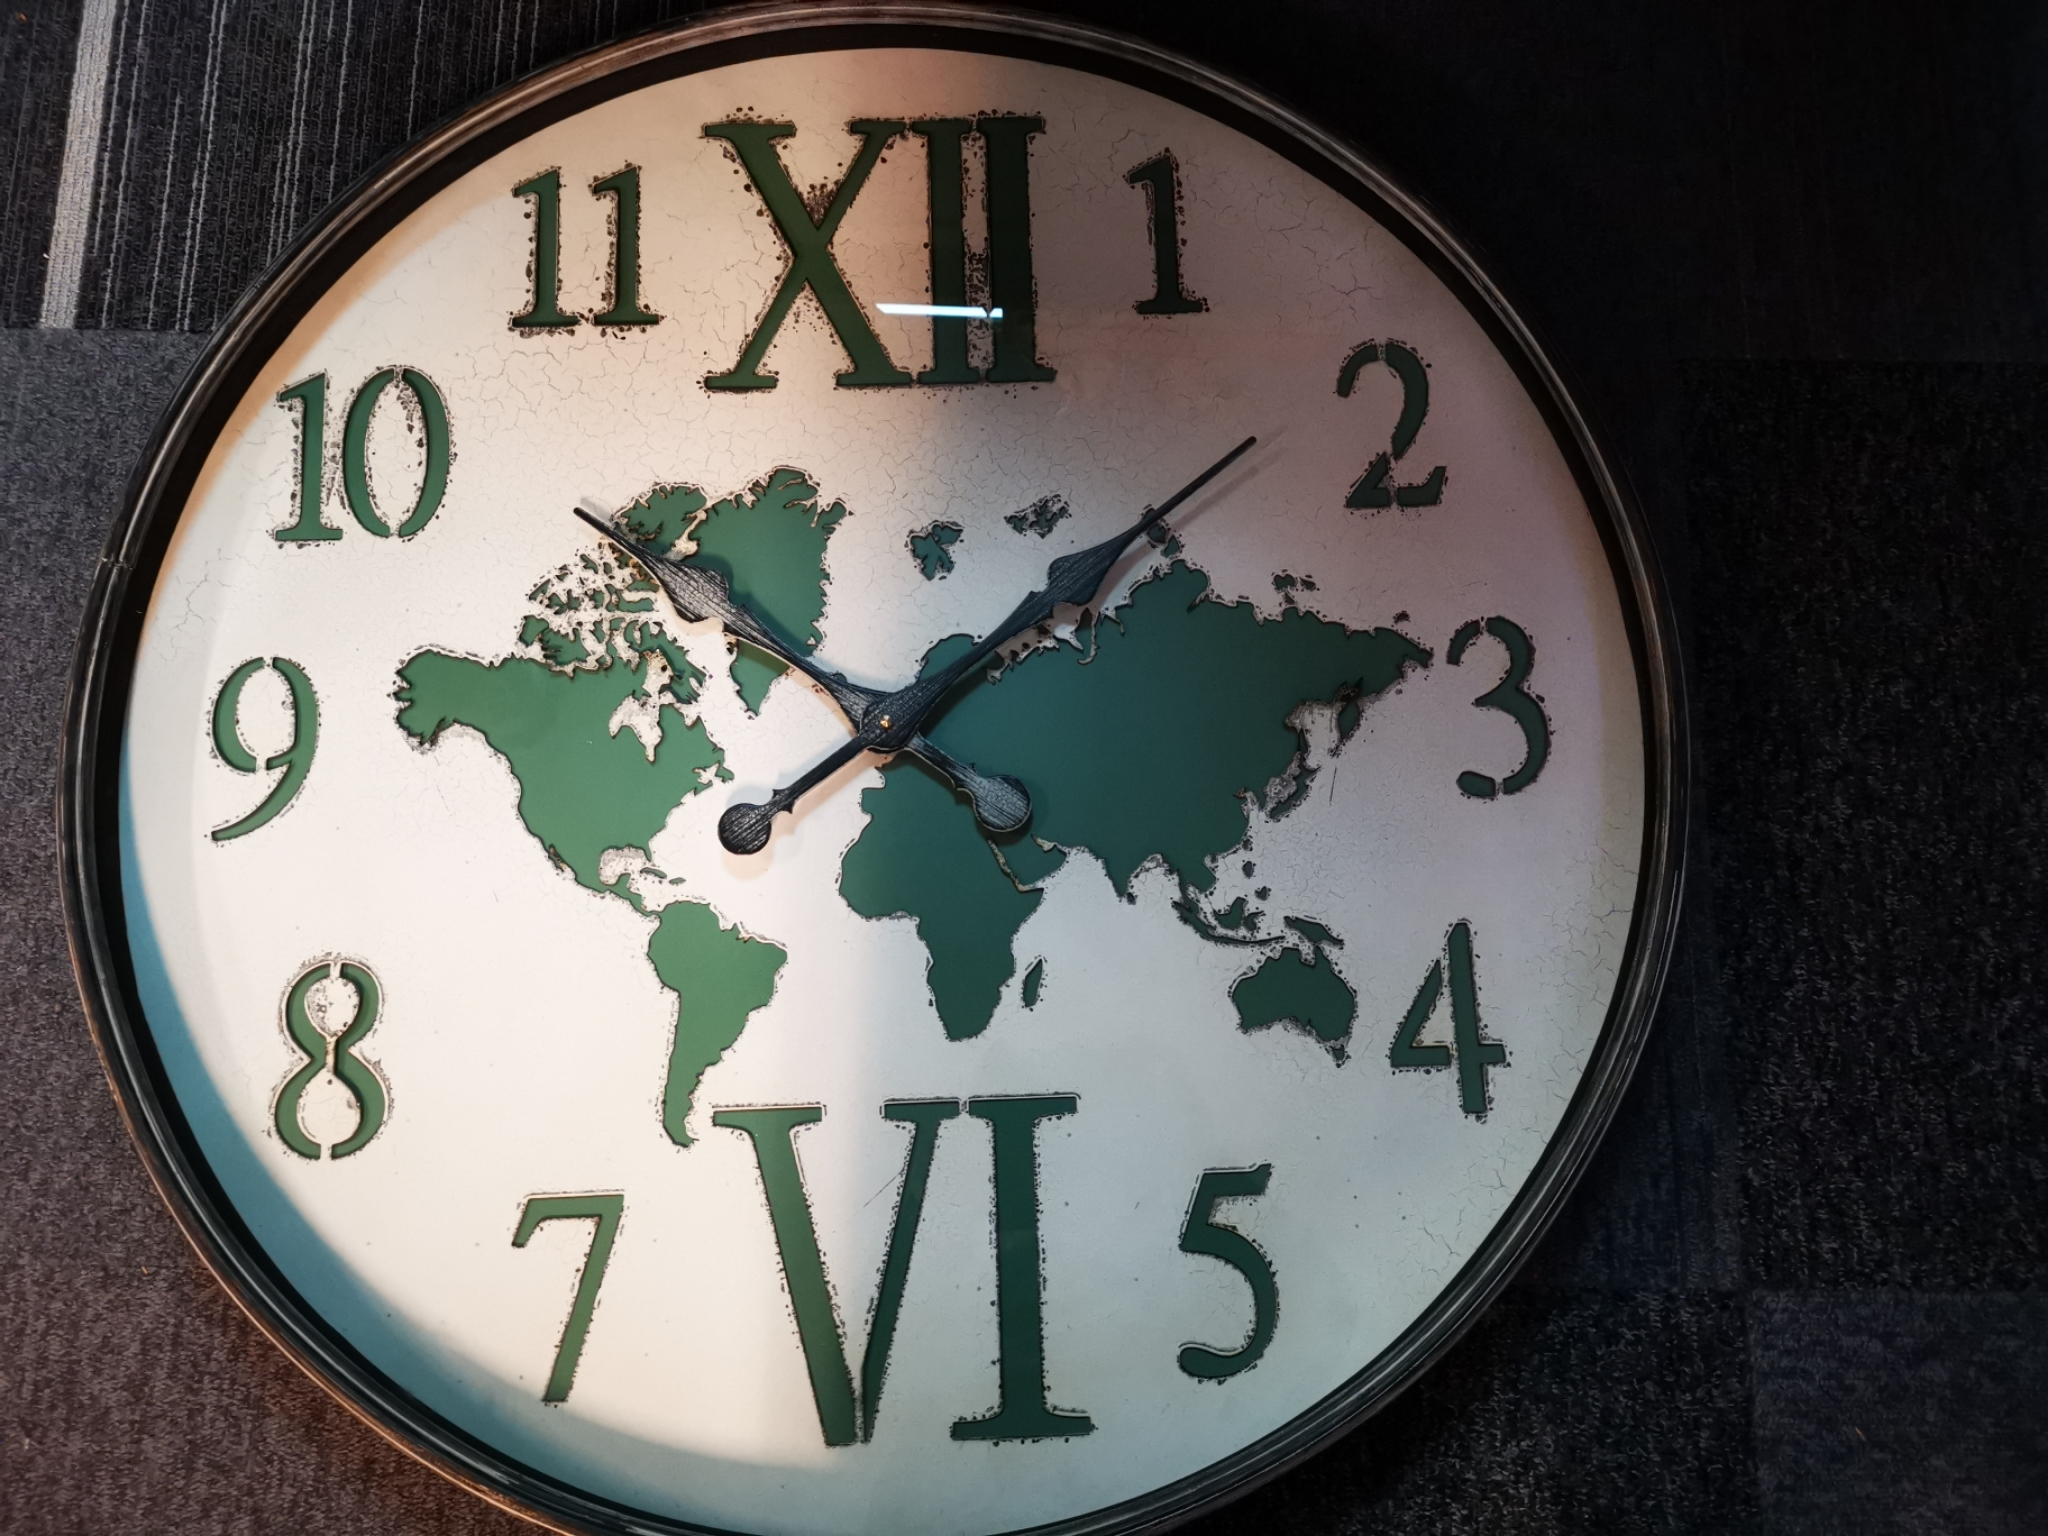 Wandklok wereldkaart groen/grijs 01805